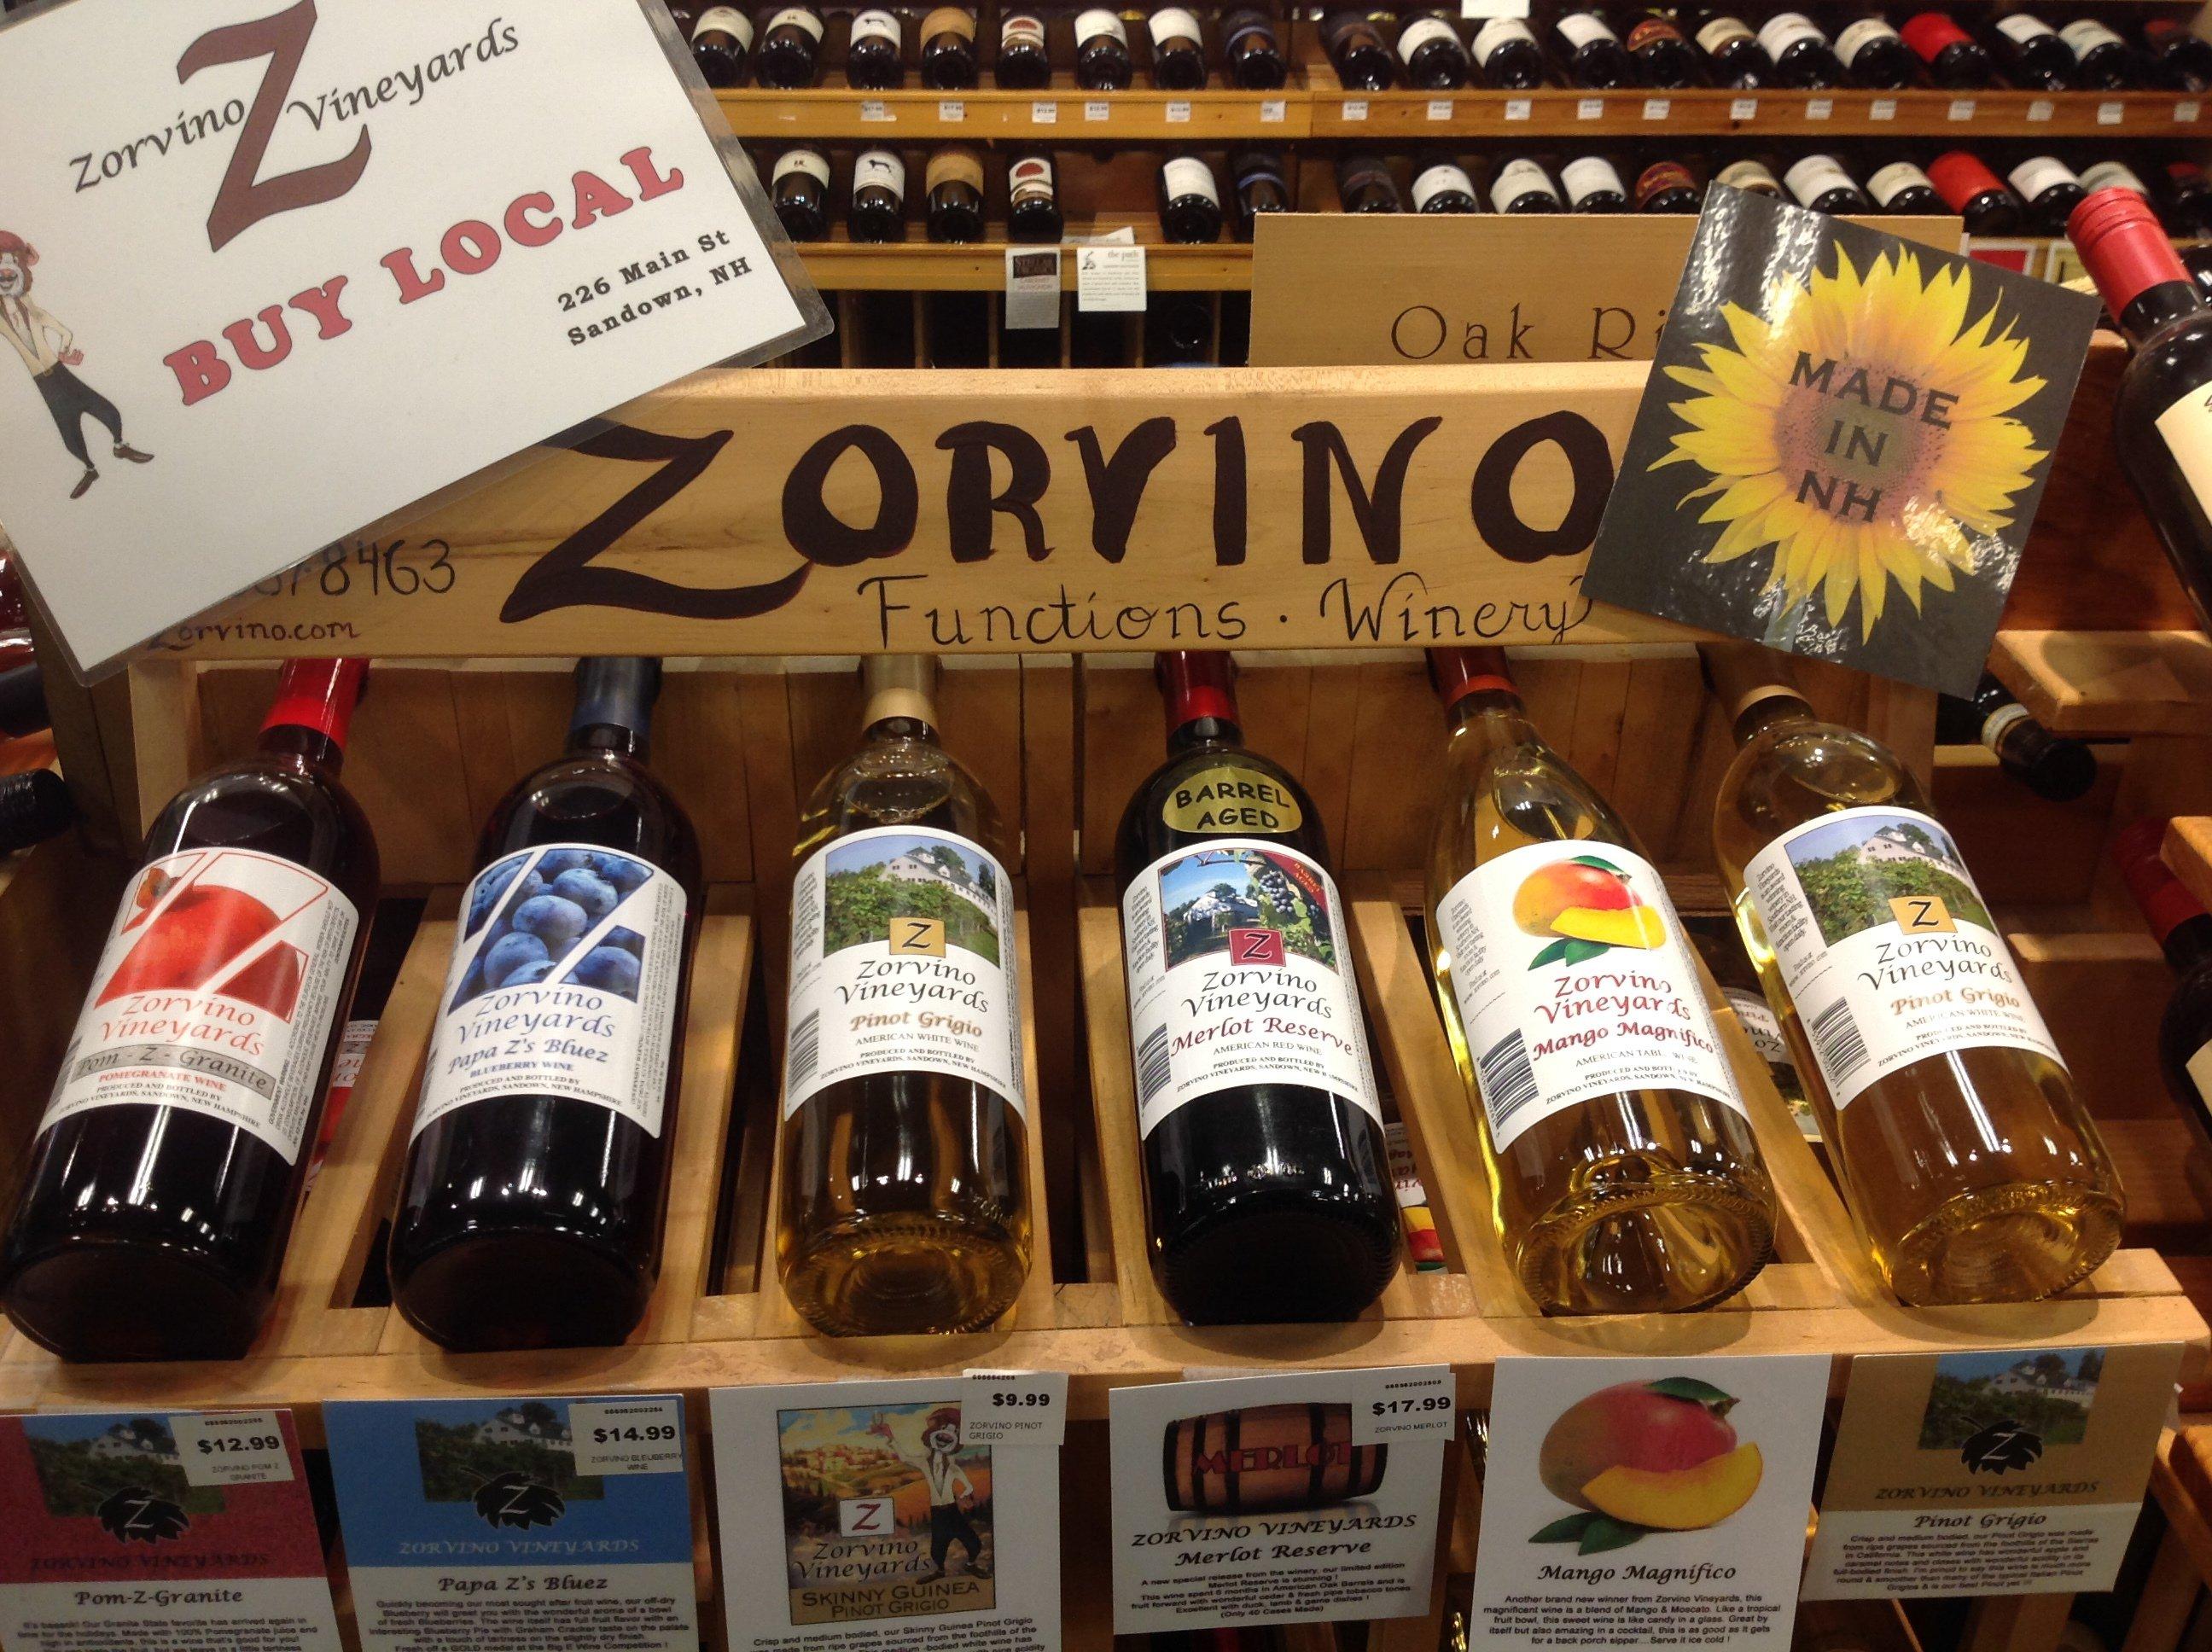 Zorvino Wines